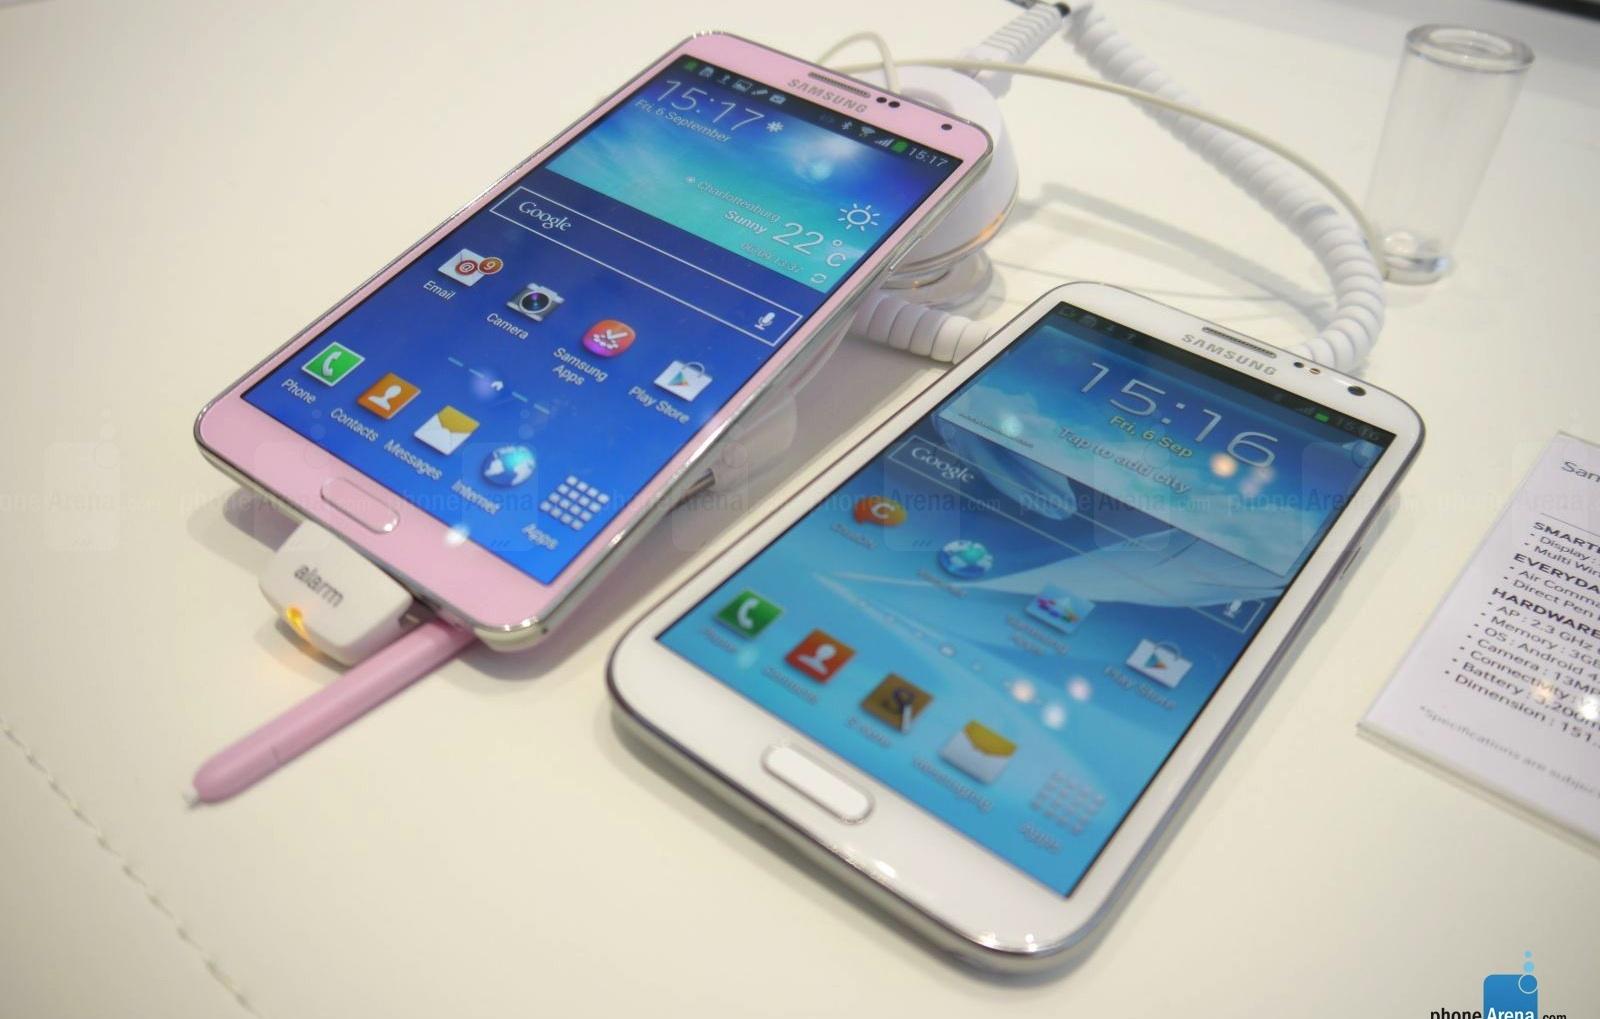 Mobile-review com Обзор Samsung Galaxy S3 – флагман